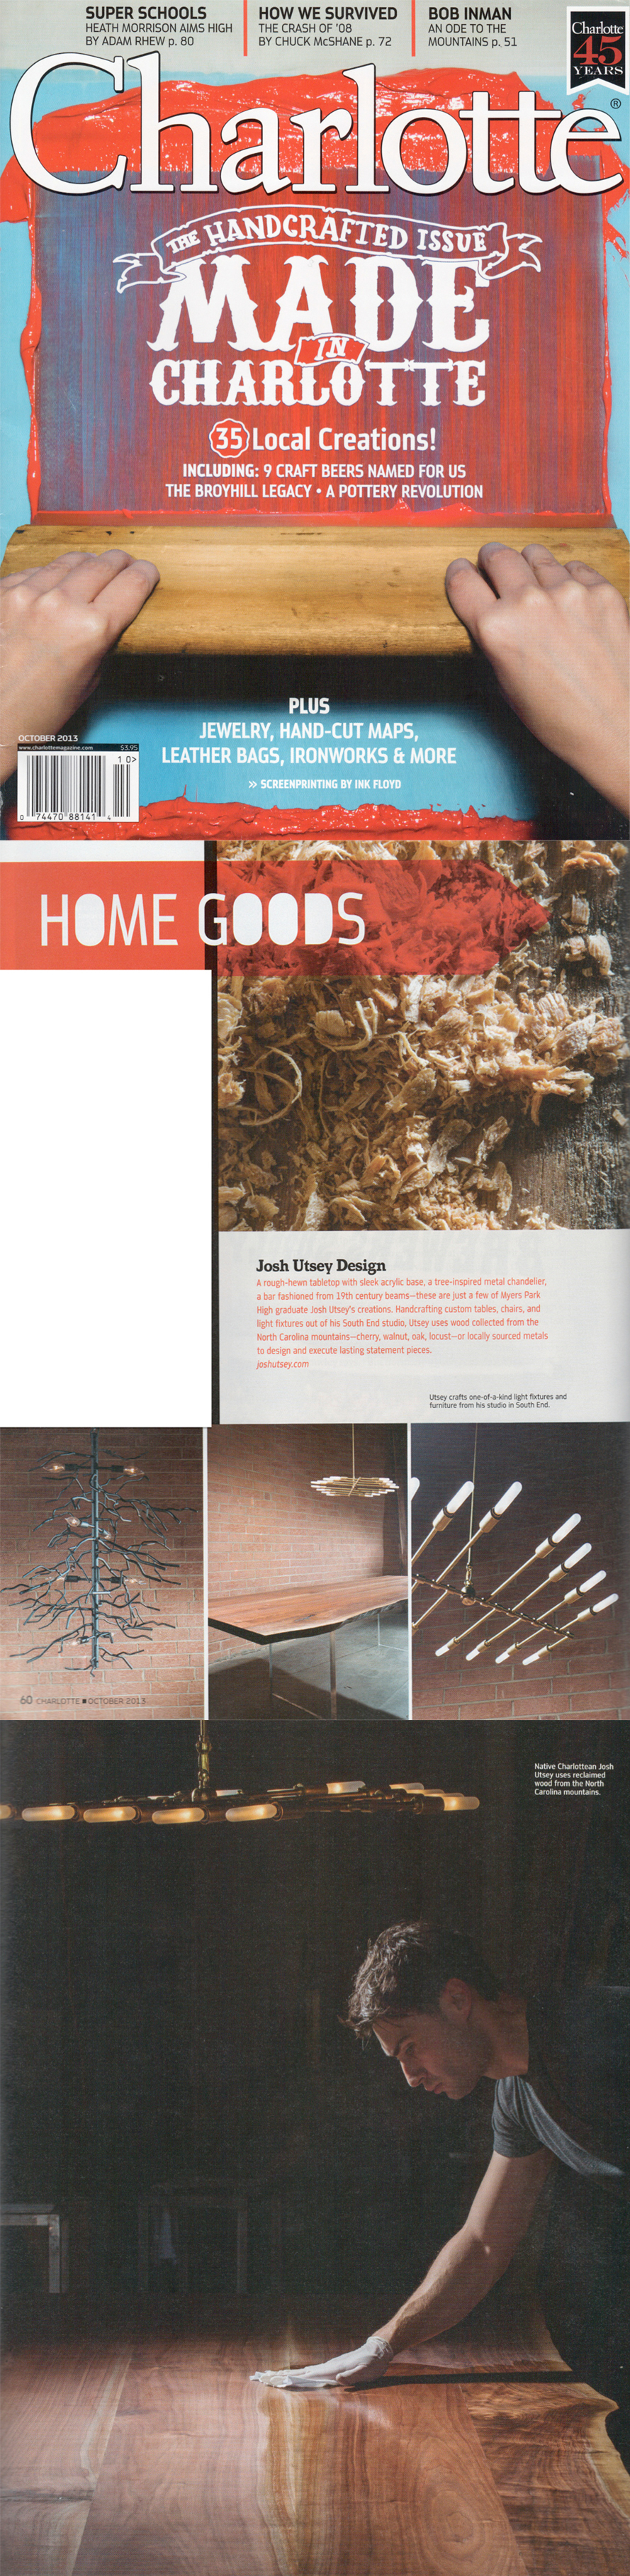 josh-utsey-design-charlotte-magazine-4.jpg